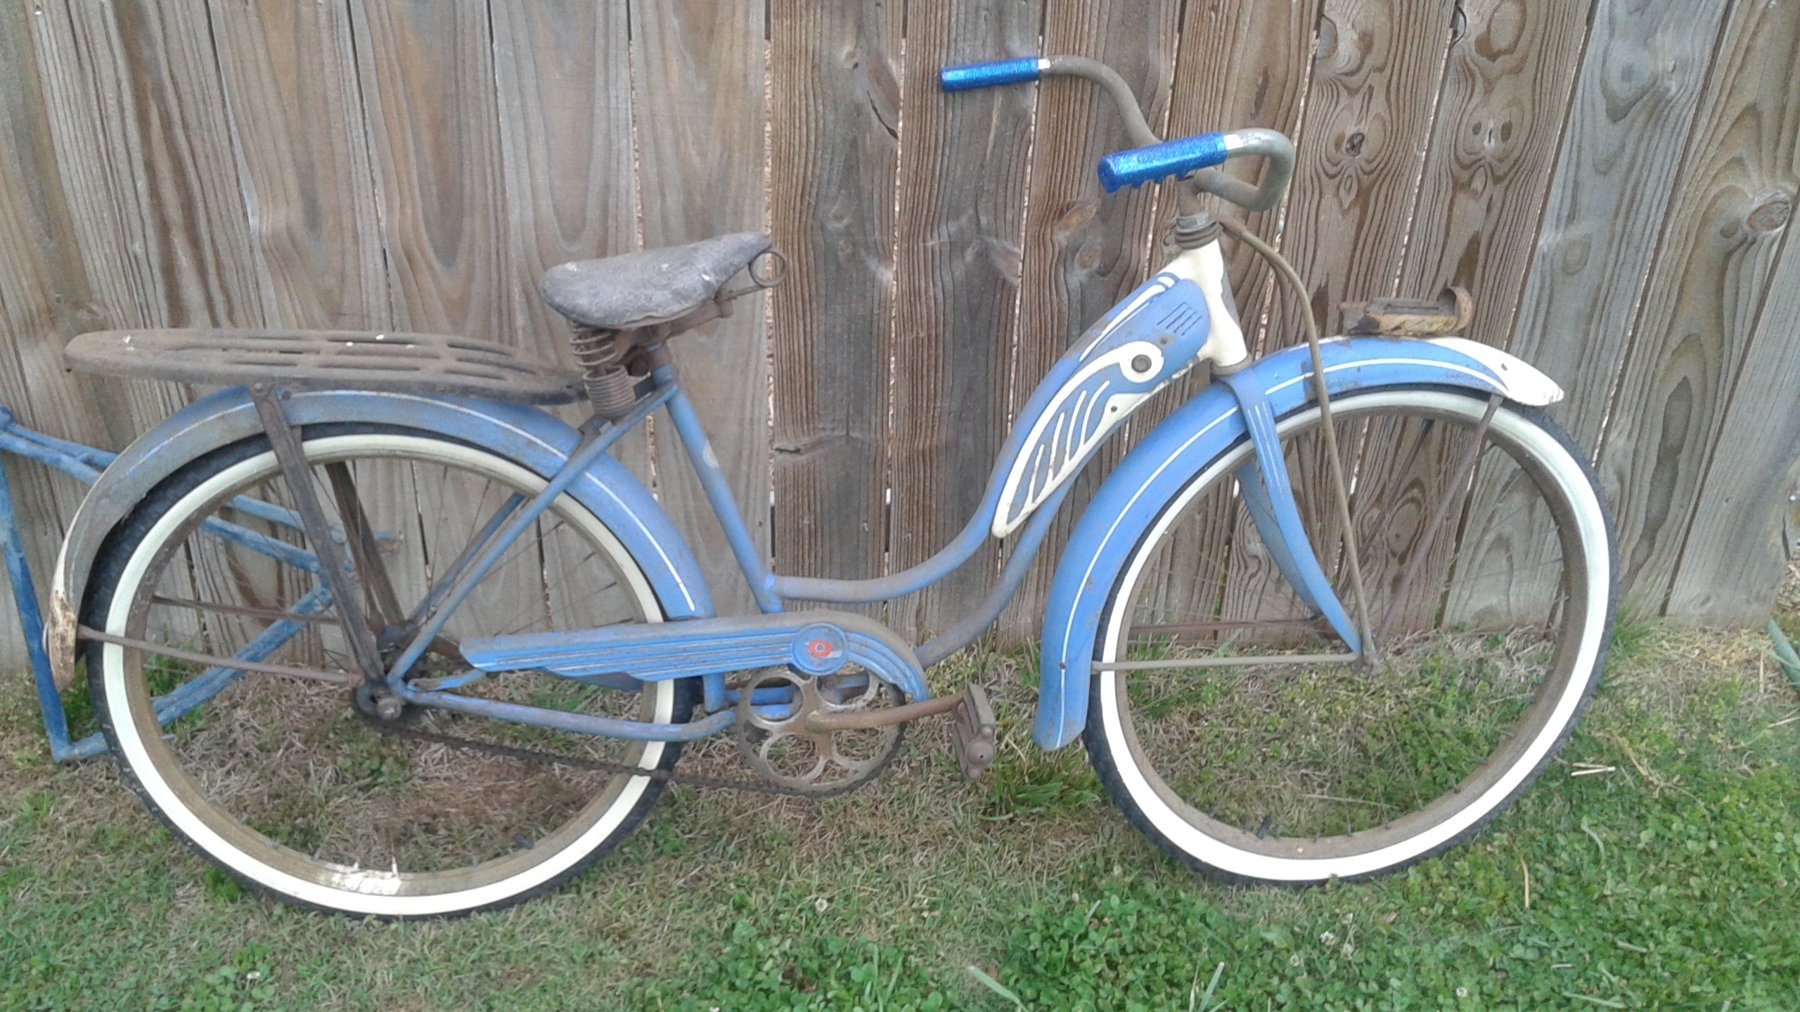 5f32d0da12b 1951 Schwinn Dx Bf Goodrich Bike | The Classic and Antique Bicycle ...